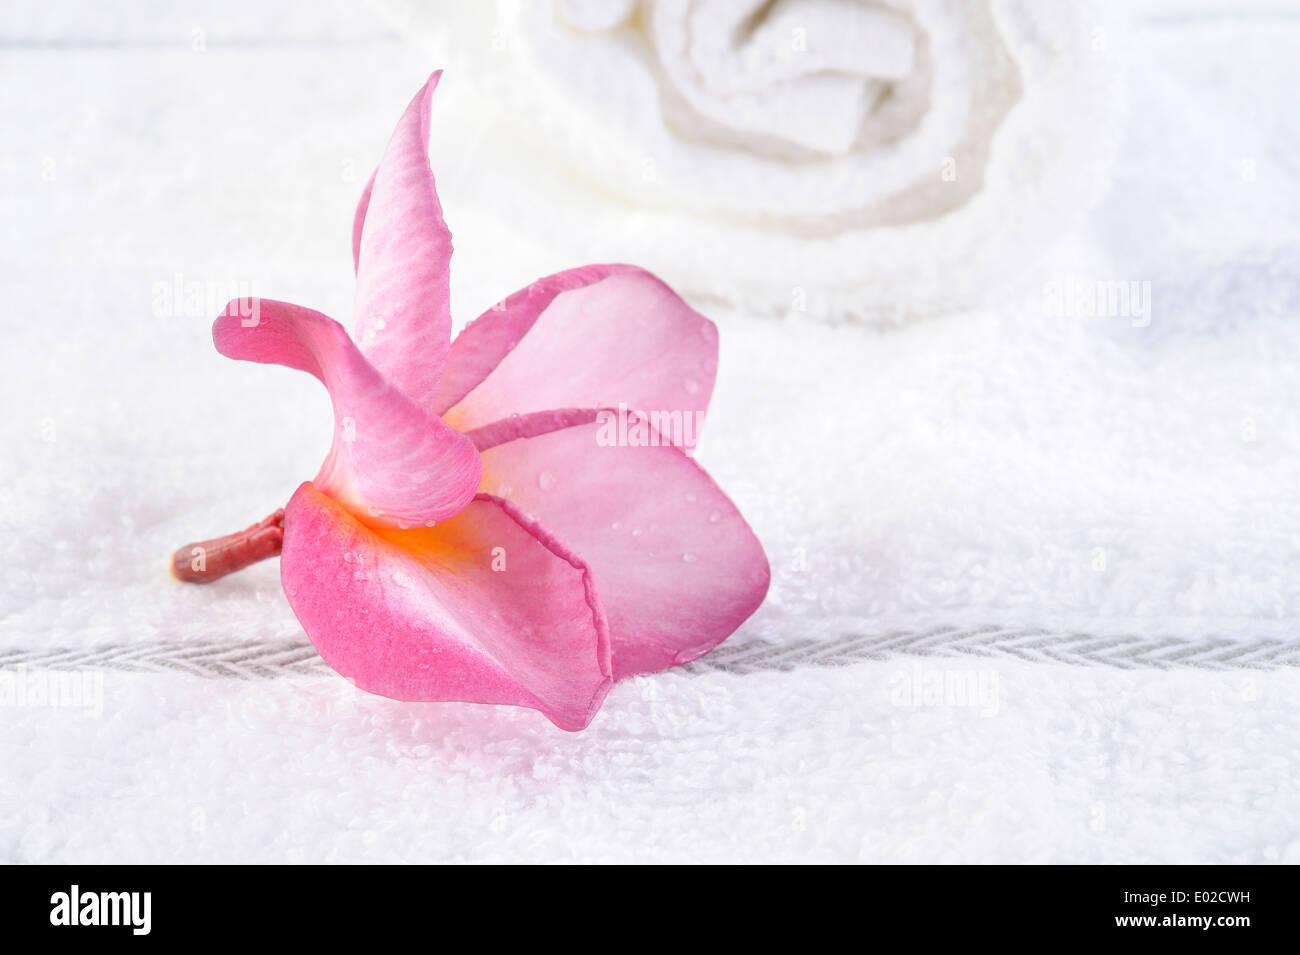 towel with plumeria flower - Stock Image